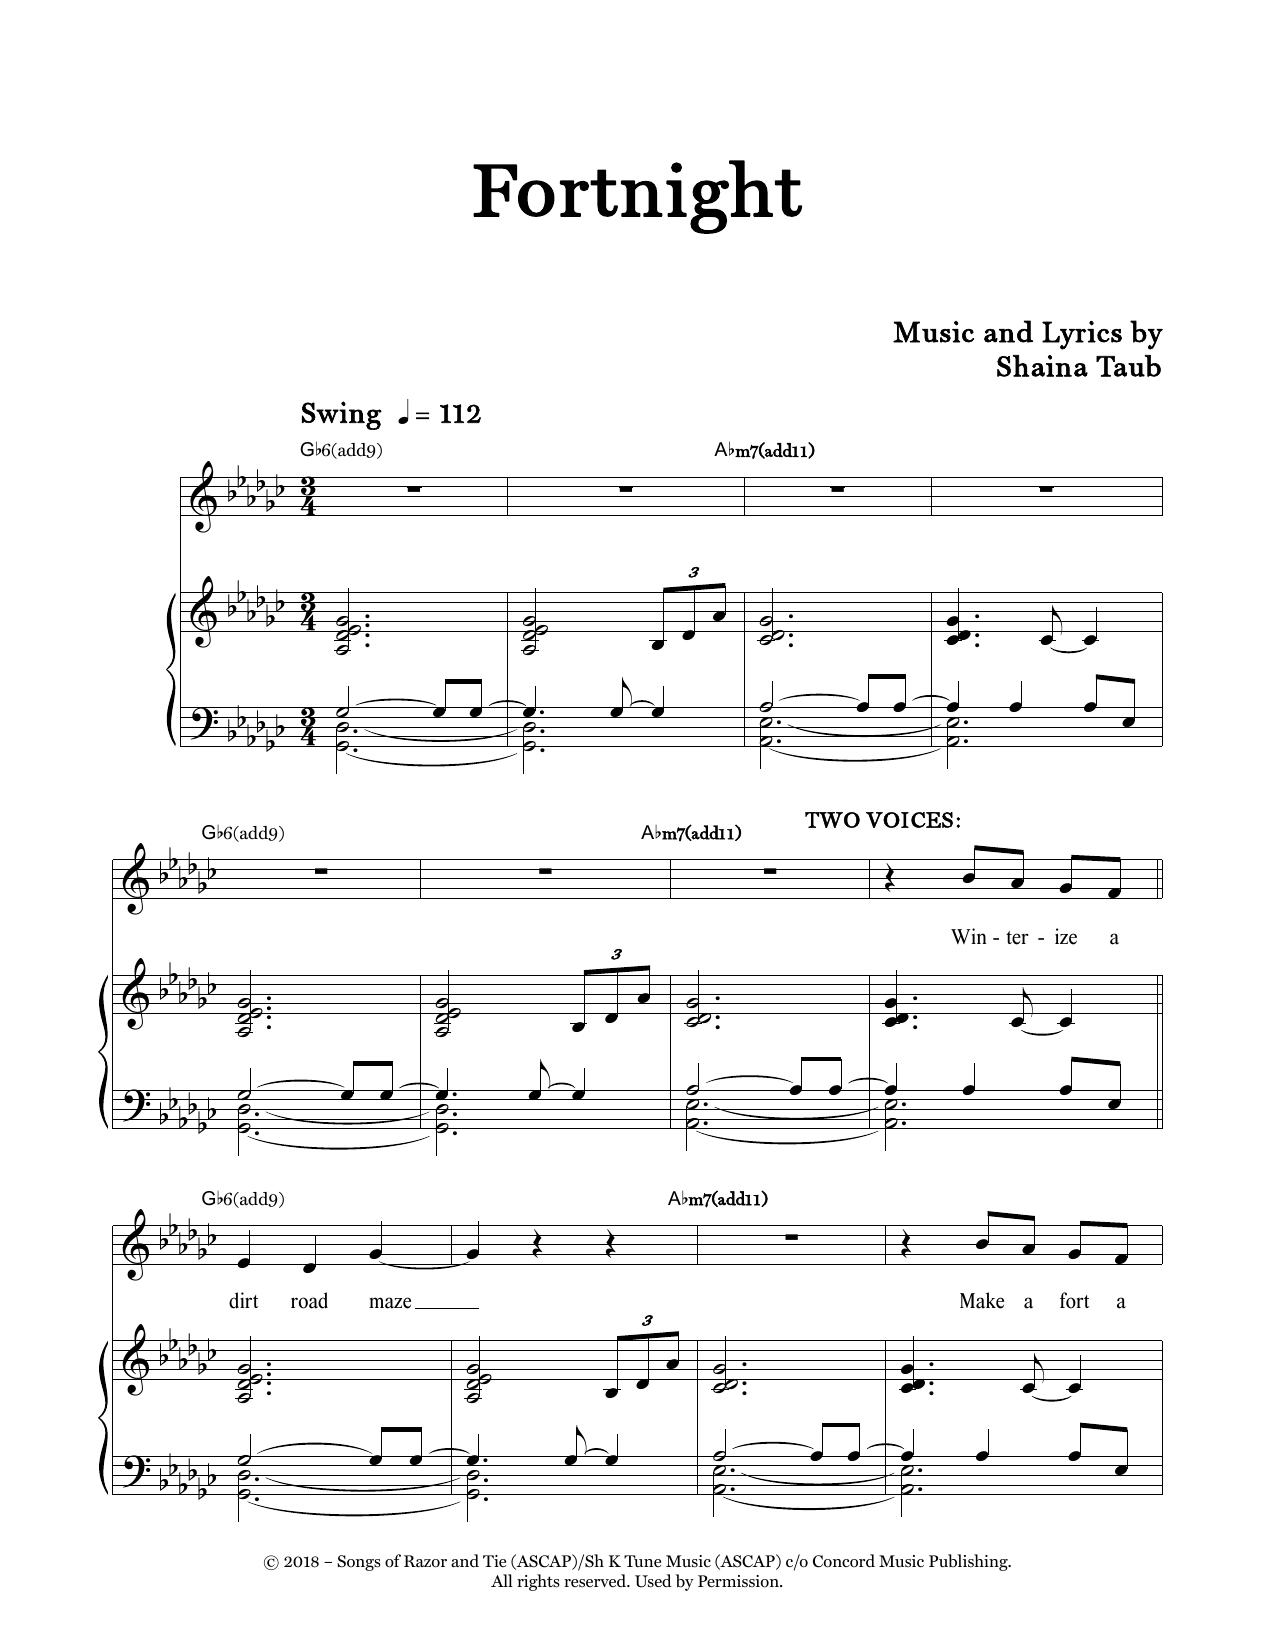 Fortnight Sheet Music